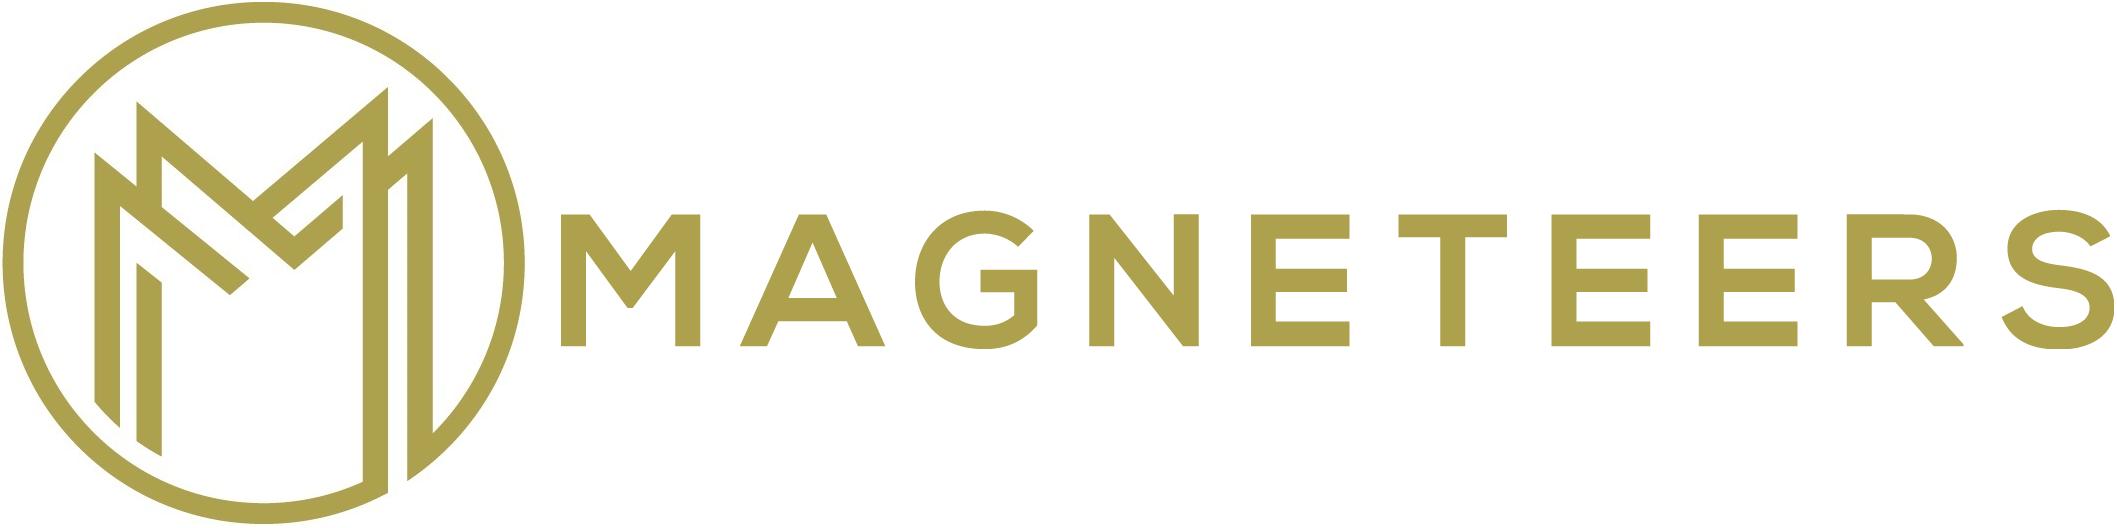 Magneteers